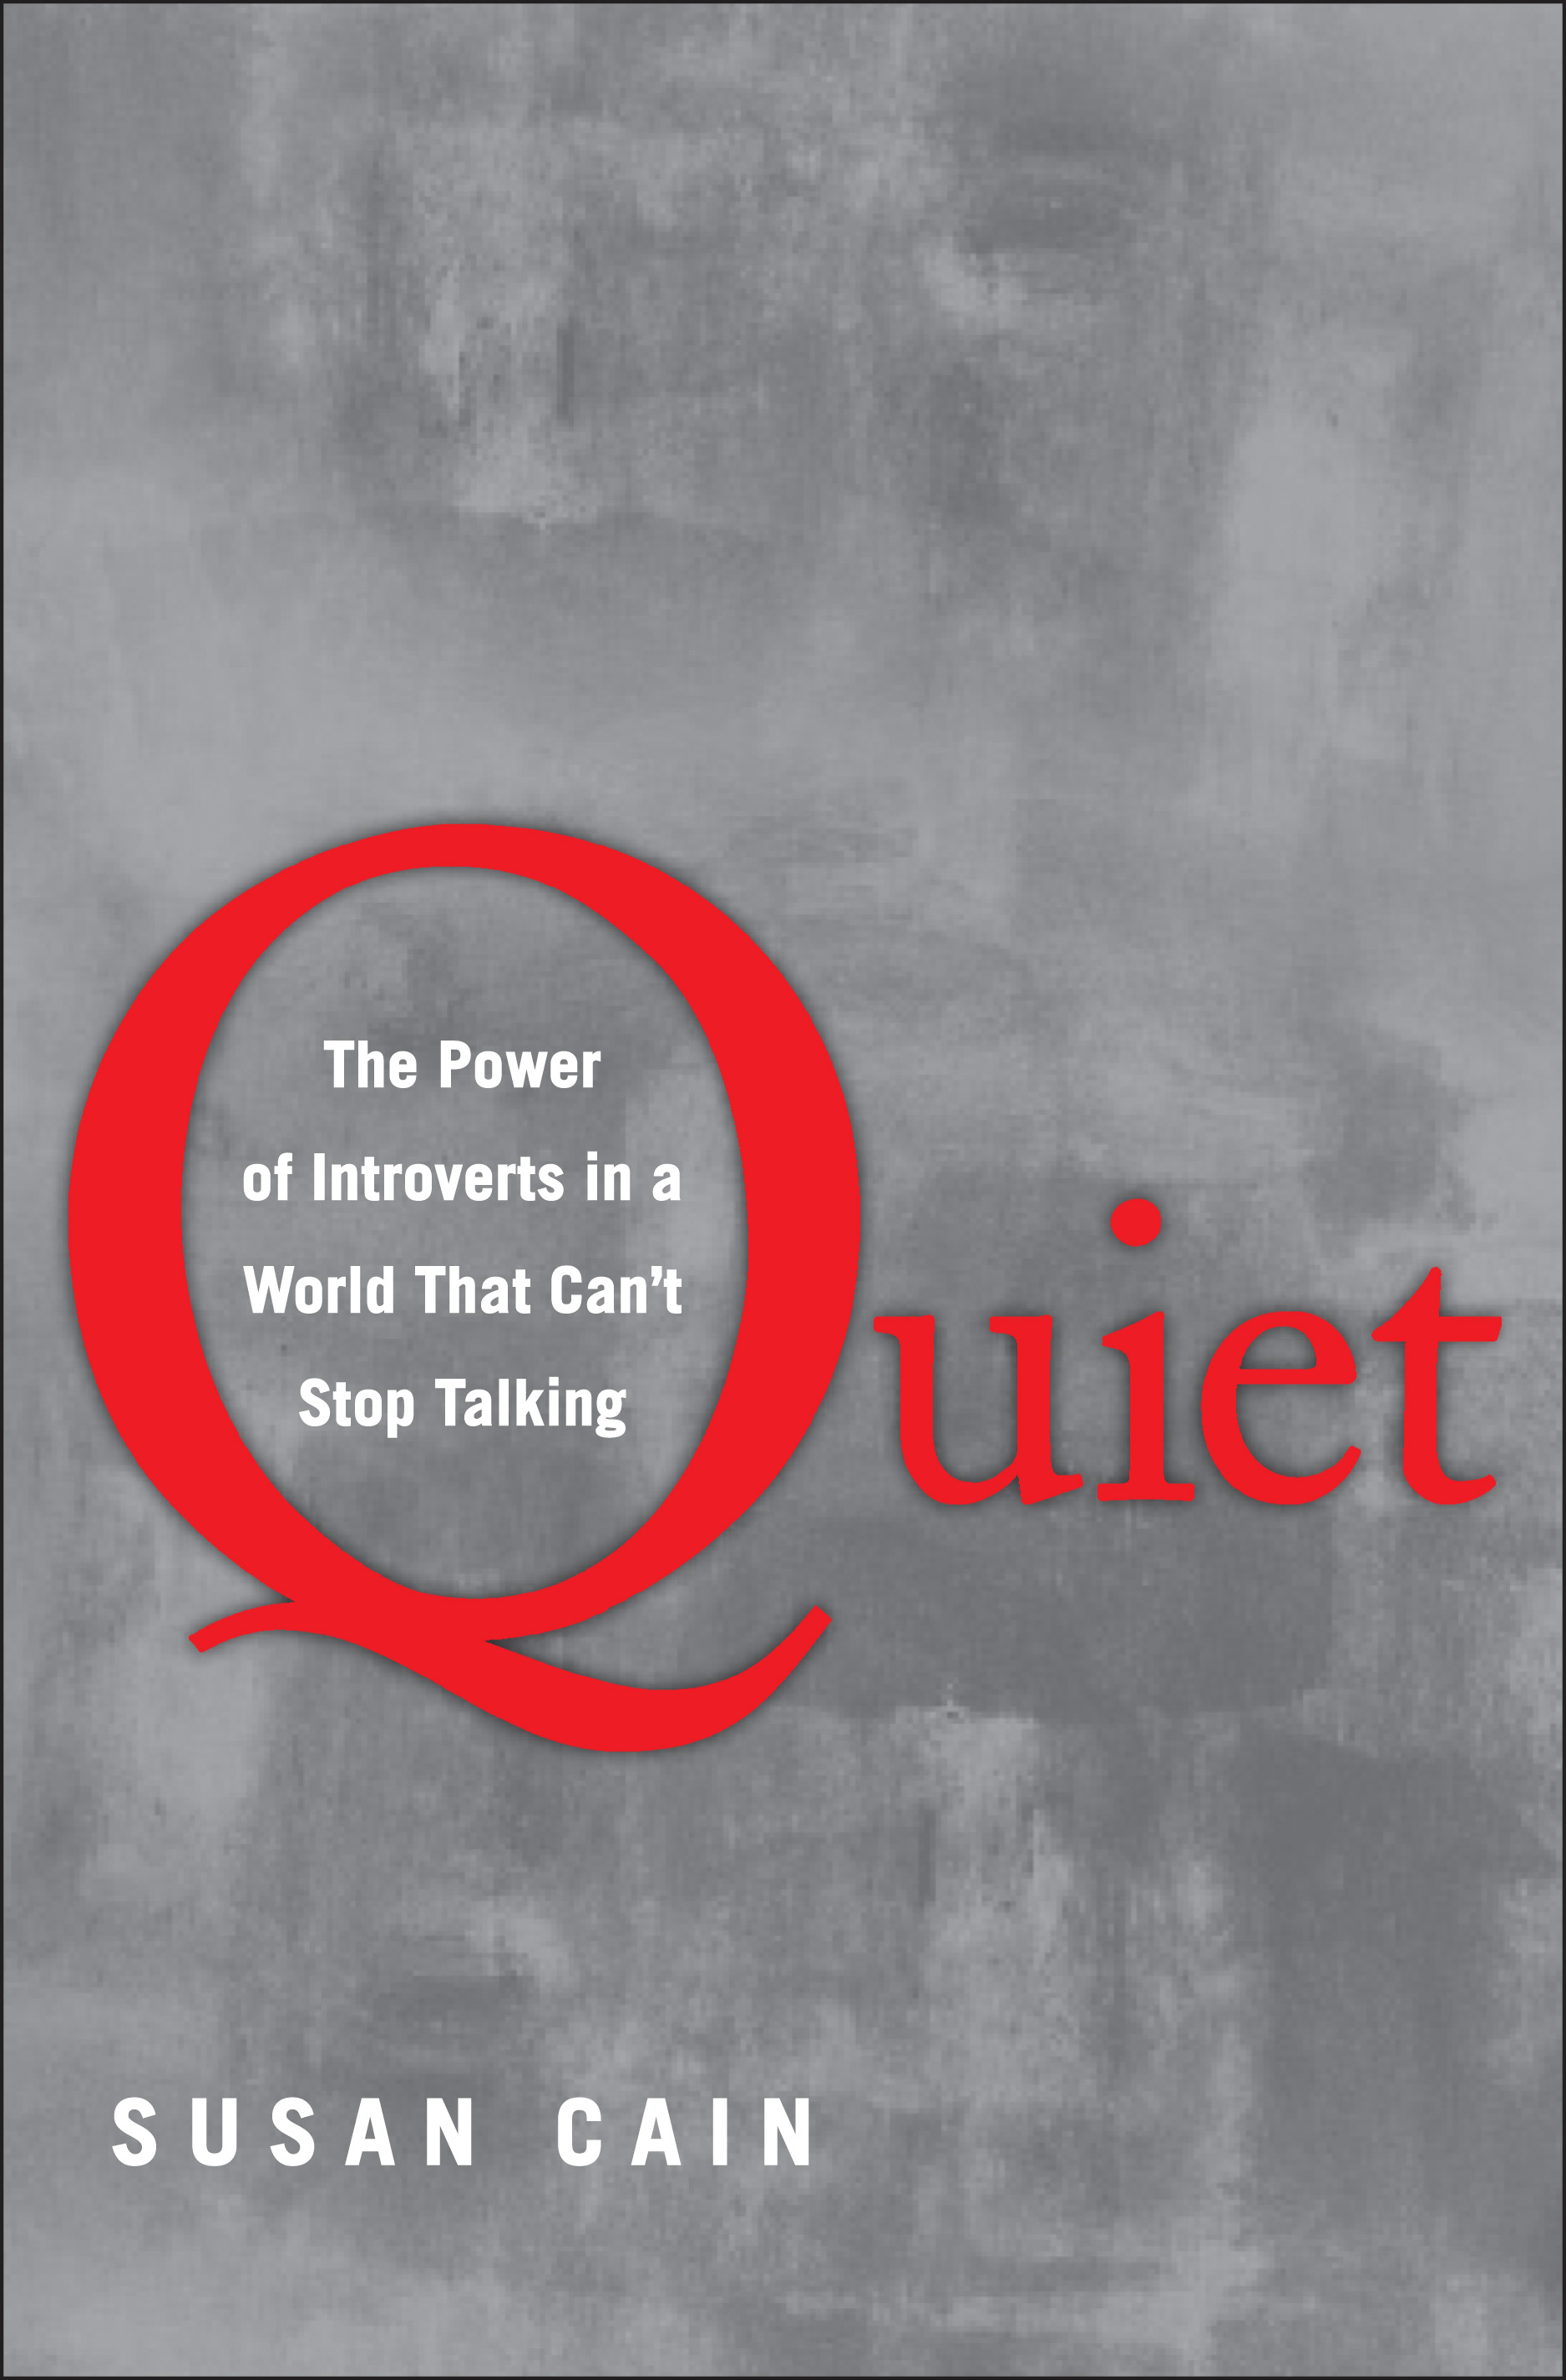 quiet-susan-cain-book-cover